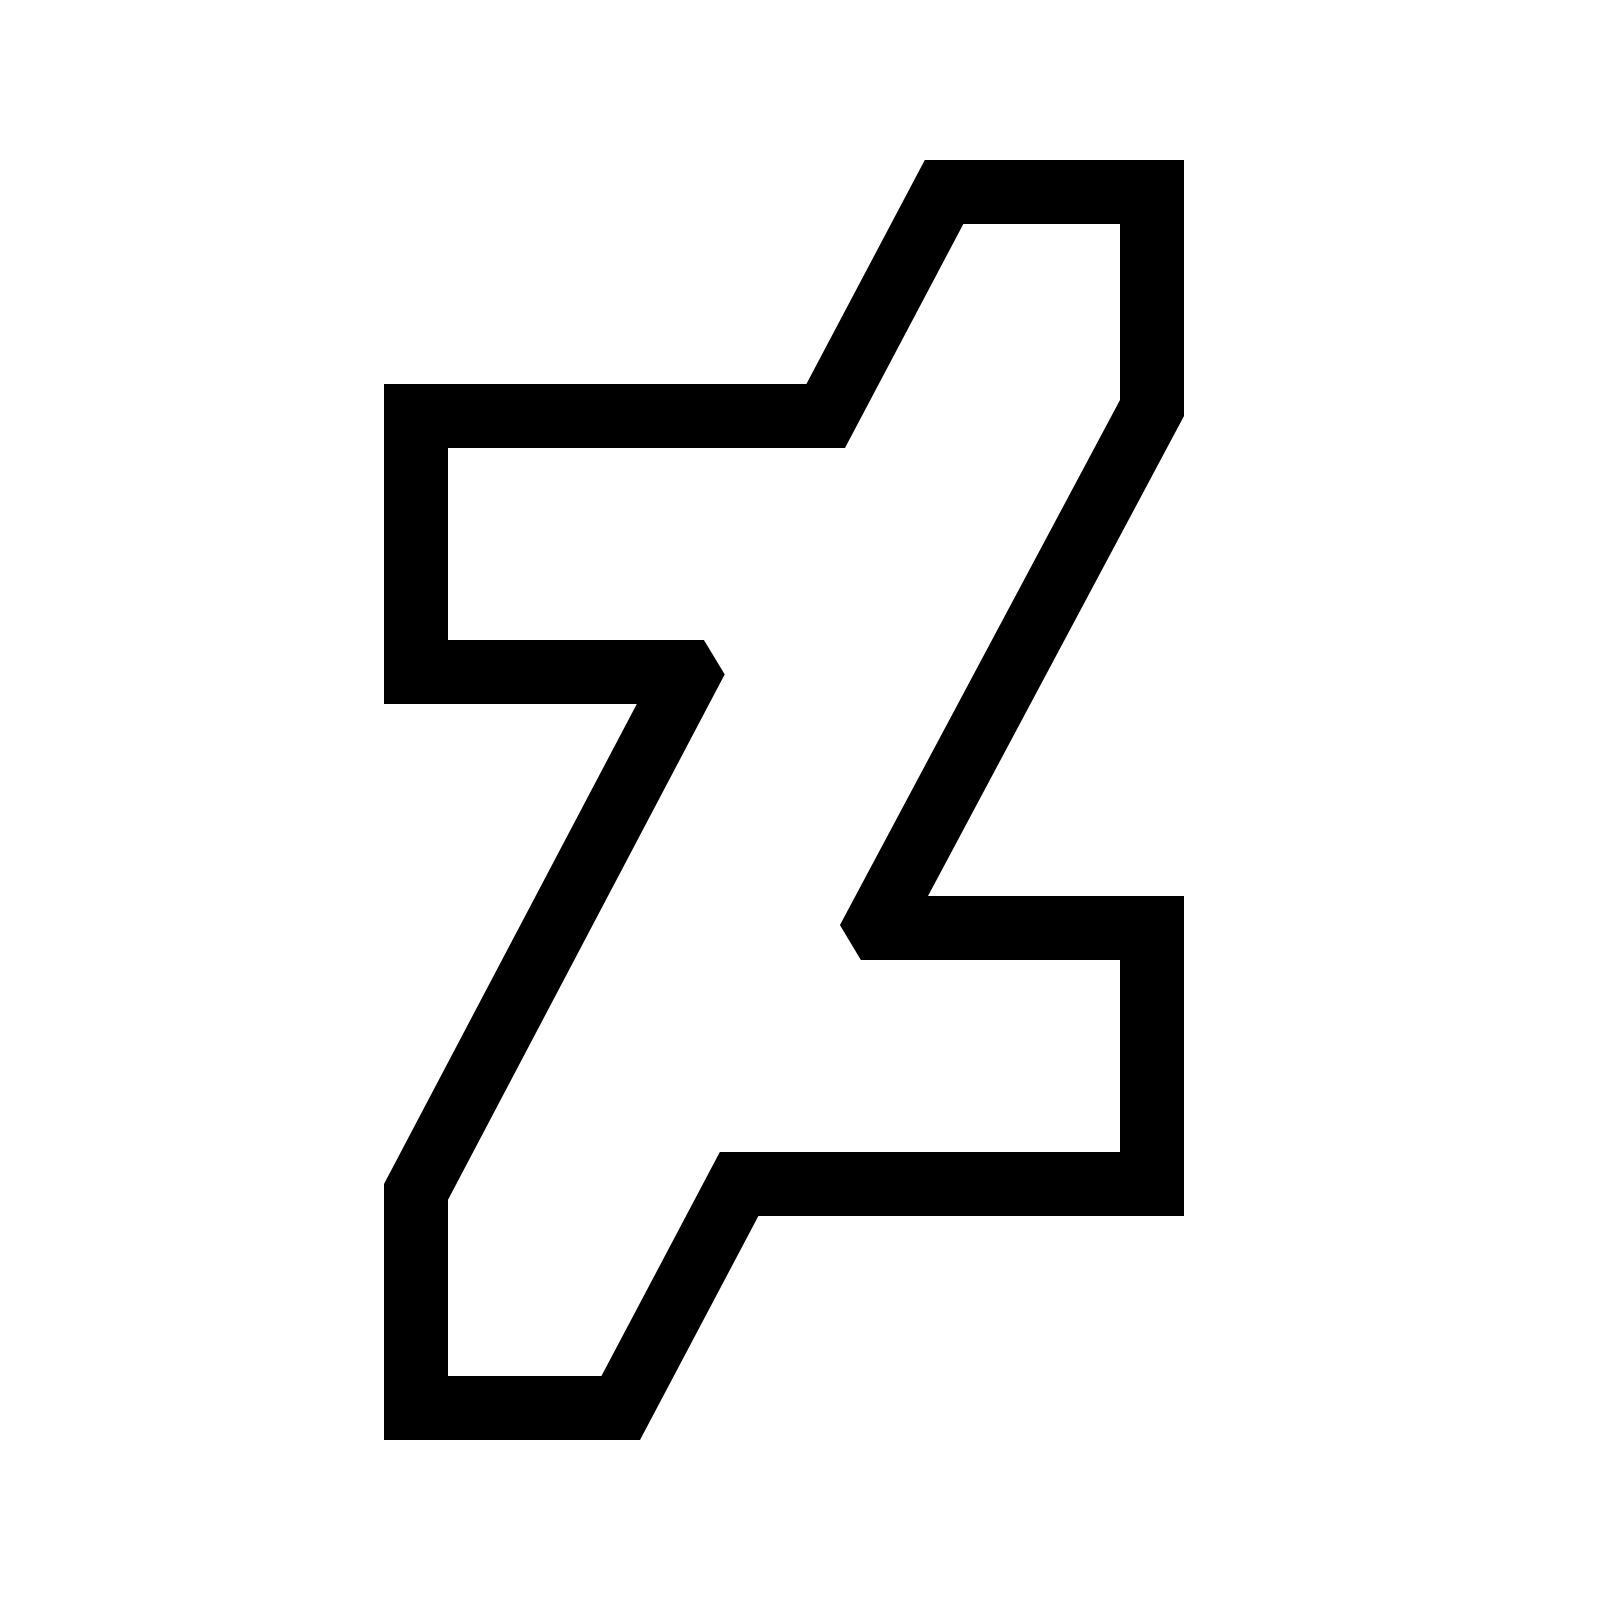 Deviantart Logo PNG - 10636